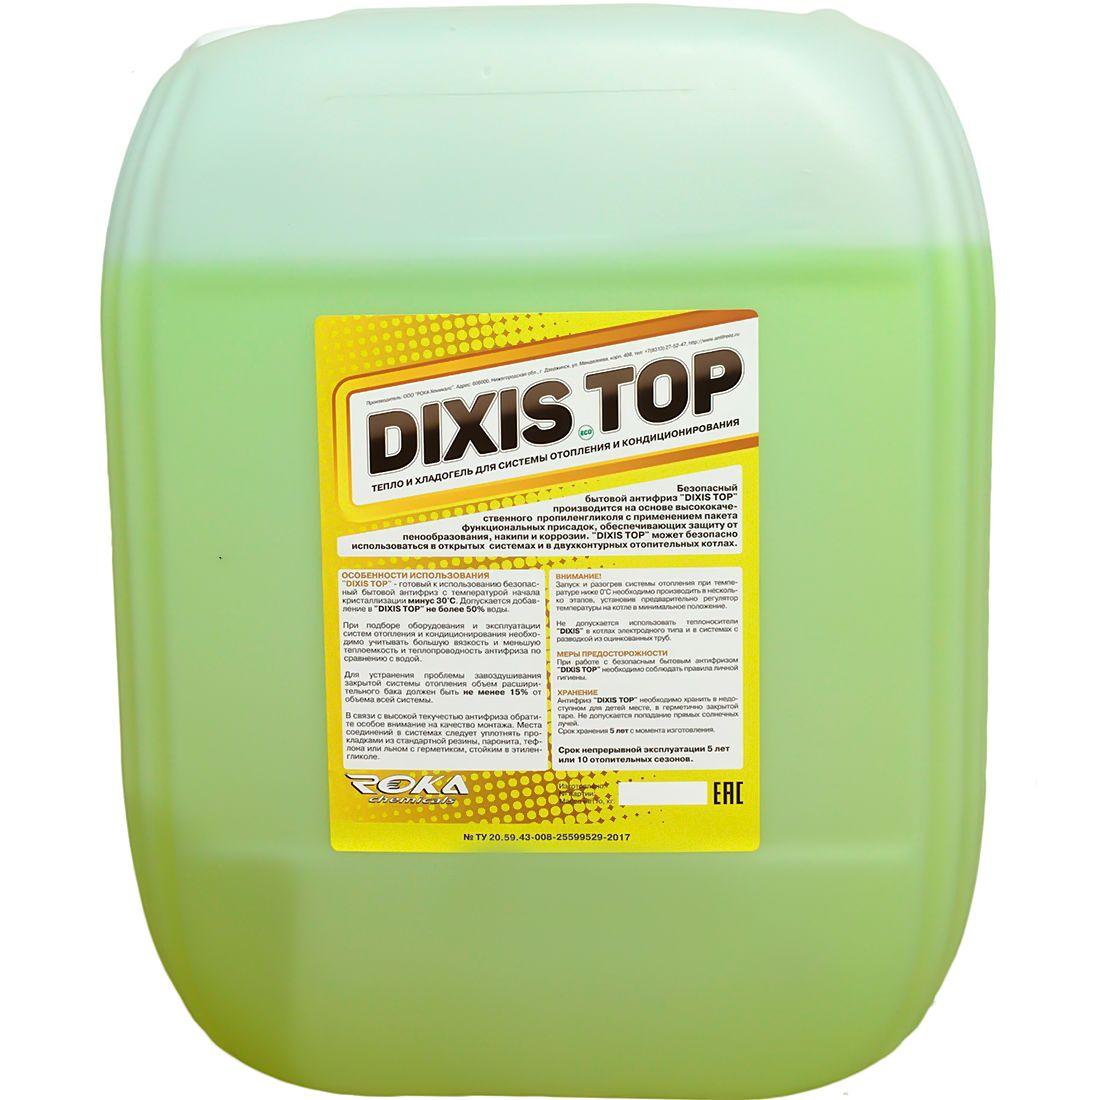 DIXIS TOP-30